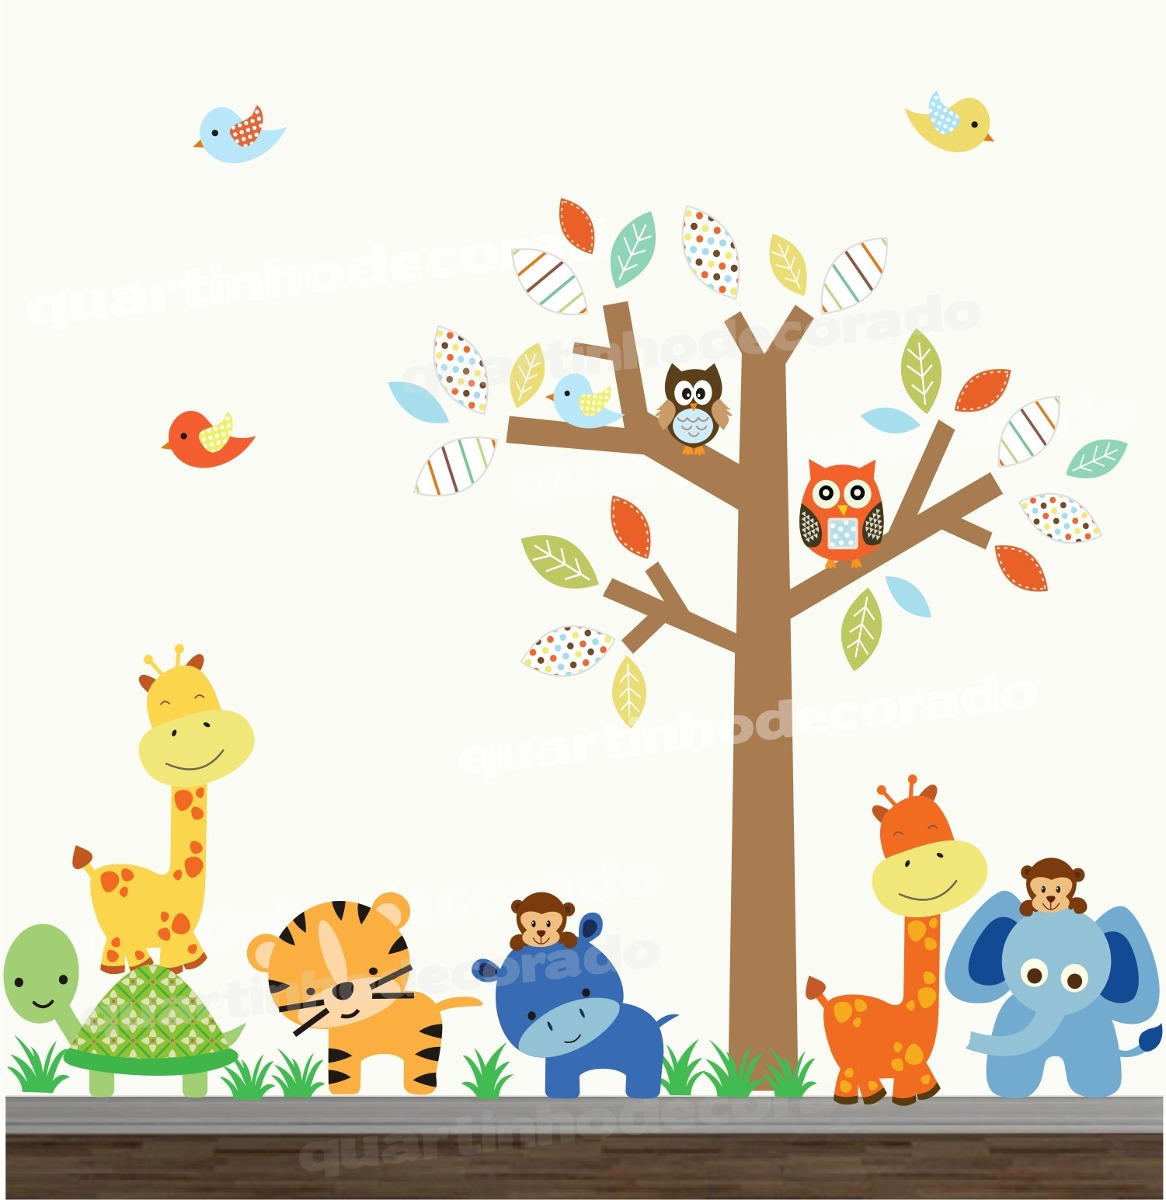 Tapete Safari Quarto Bebe : Adesivo Infantil Arvore Bebe Safari Decorativo Coruja Zoo 57 – R$ 148